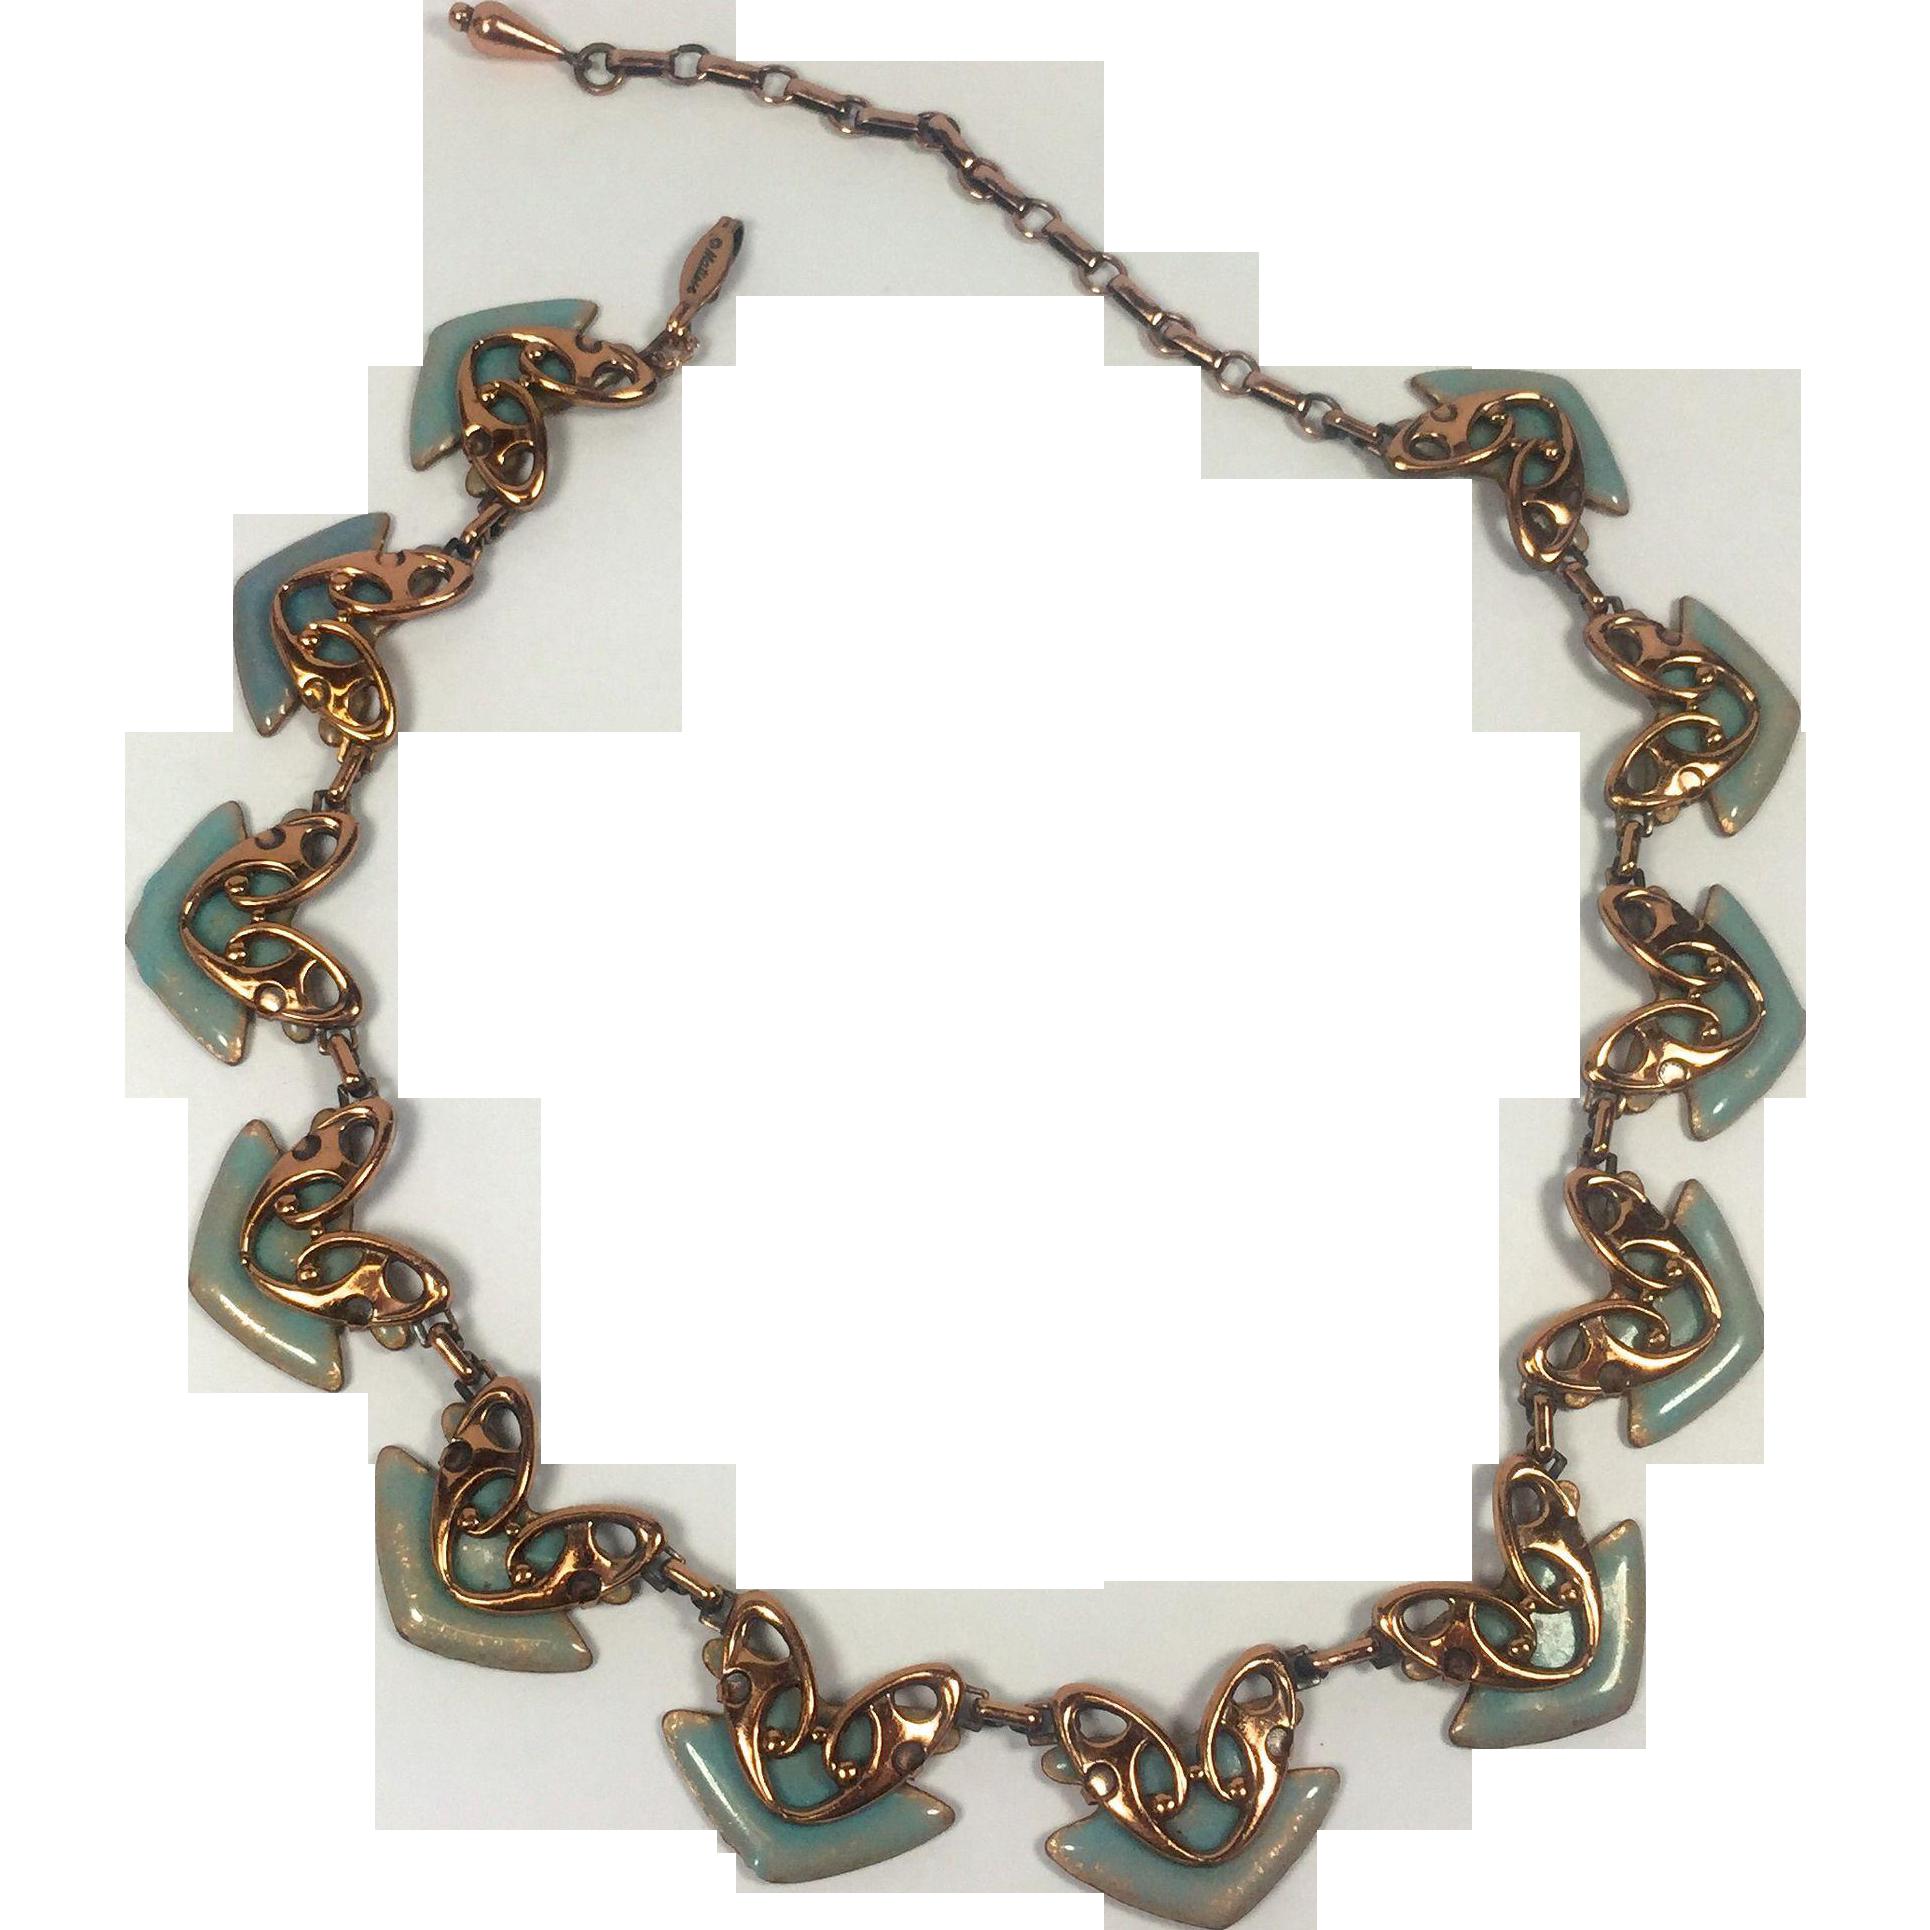 Matisse Renoir Copper & Turquoise Enamel Geometric Mod Necklace